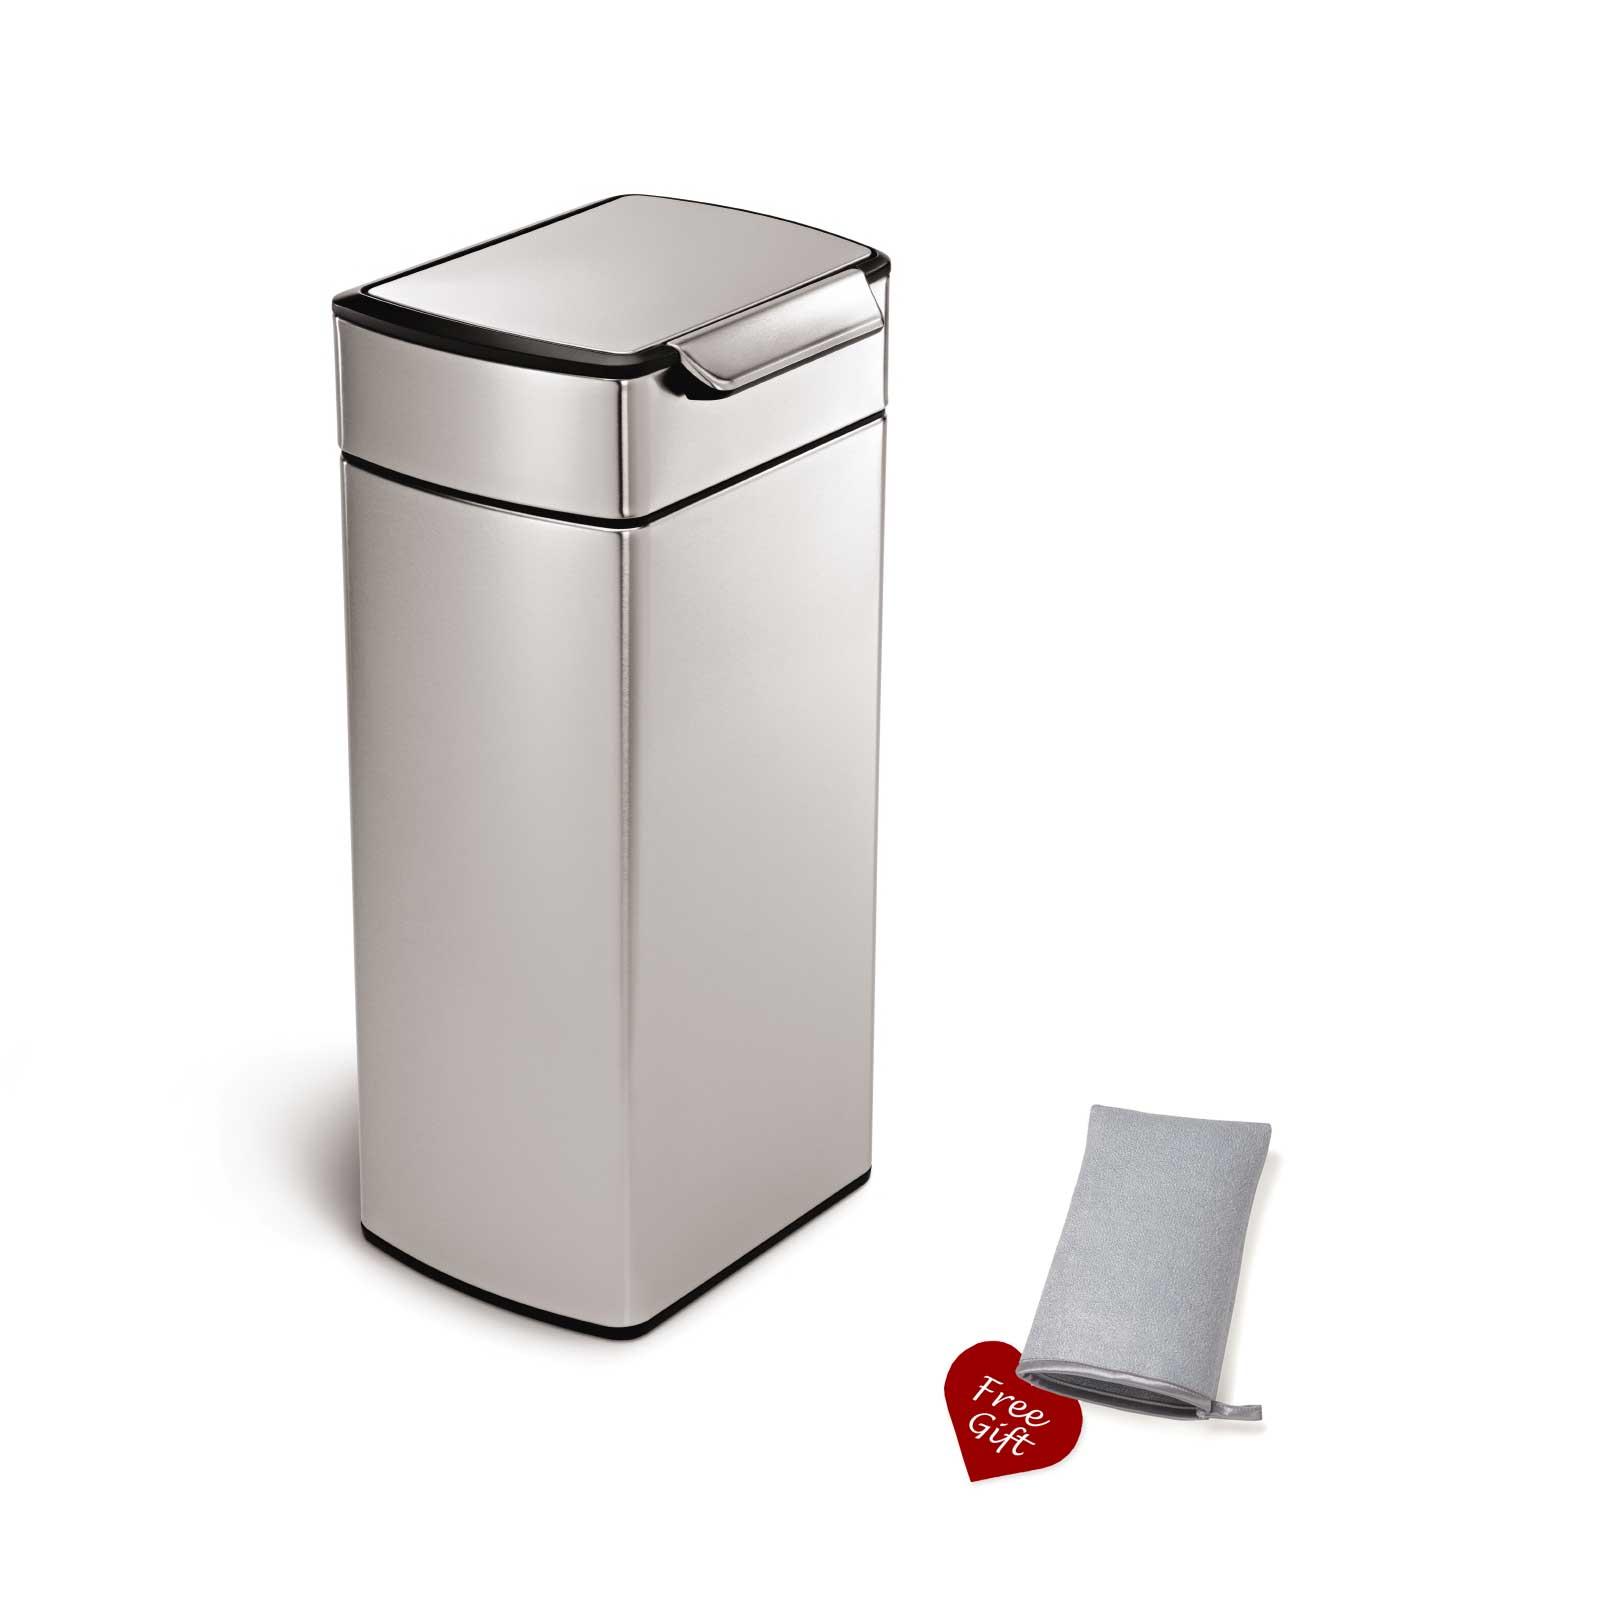 Simplehuman Recycle | 20 Liter Trash Bags | Simplehuman Recycler